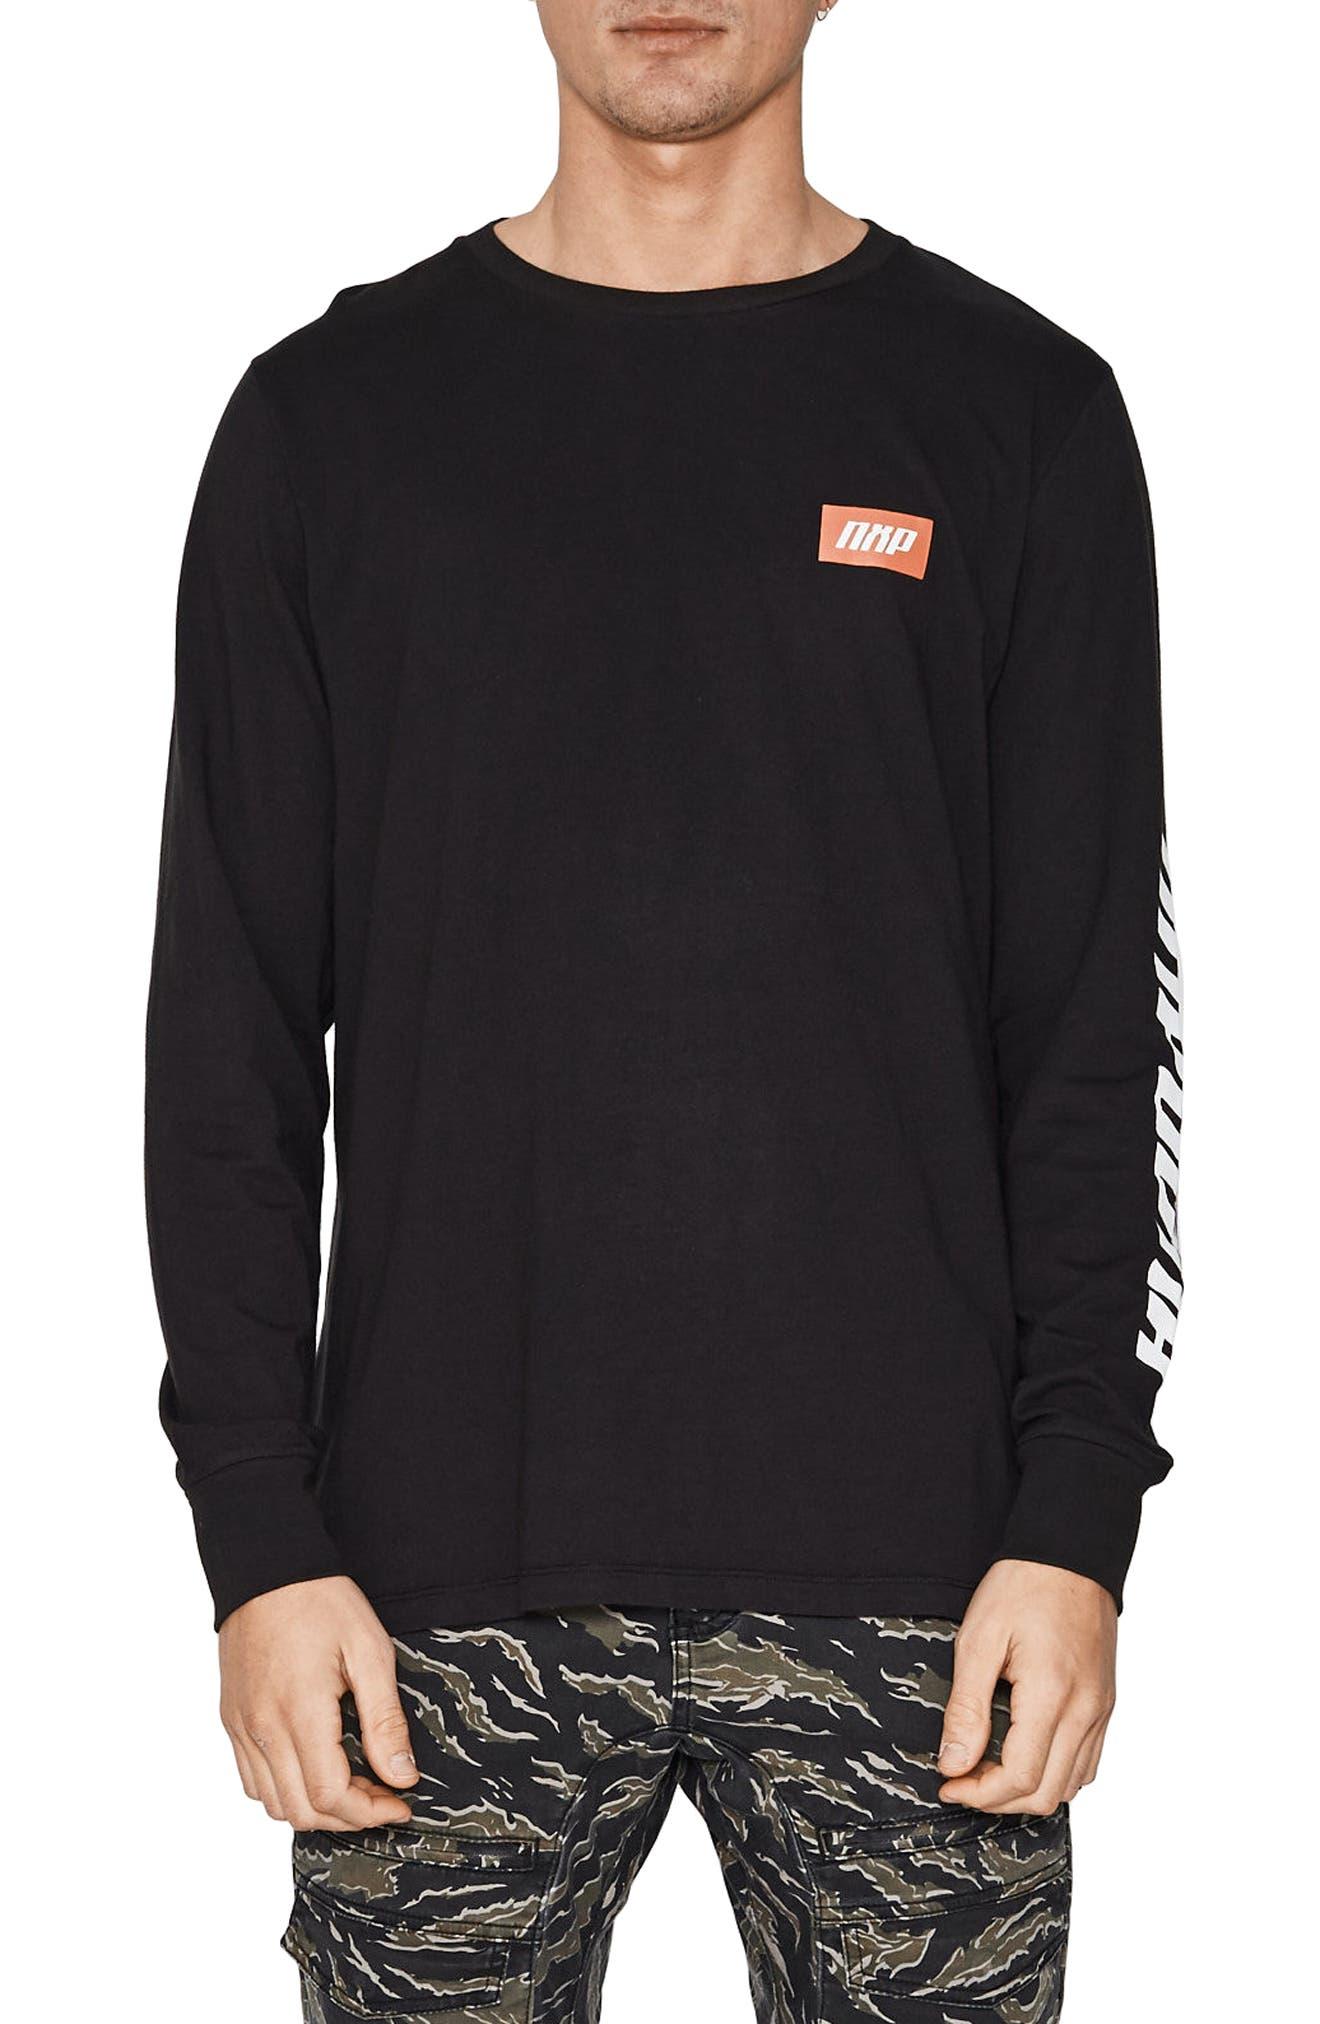 Ultimate Power T-Shirt,                         Main,                         color, Jet Black